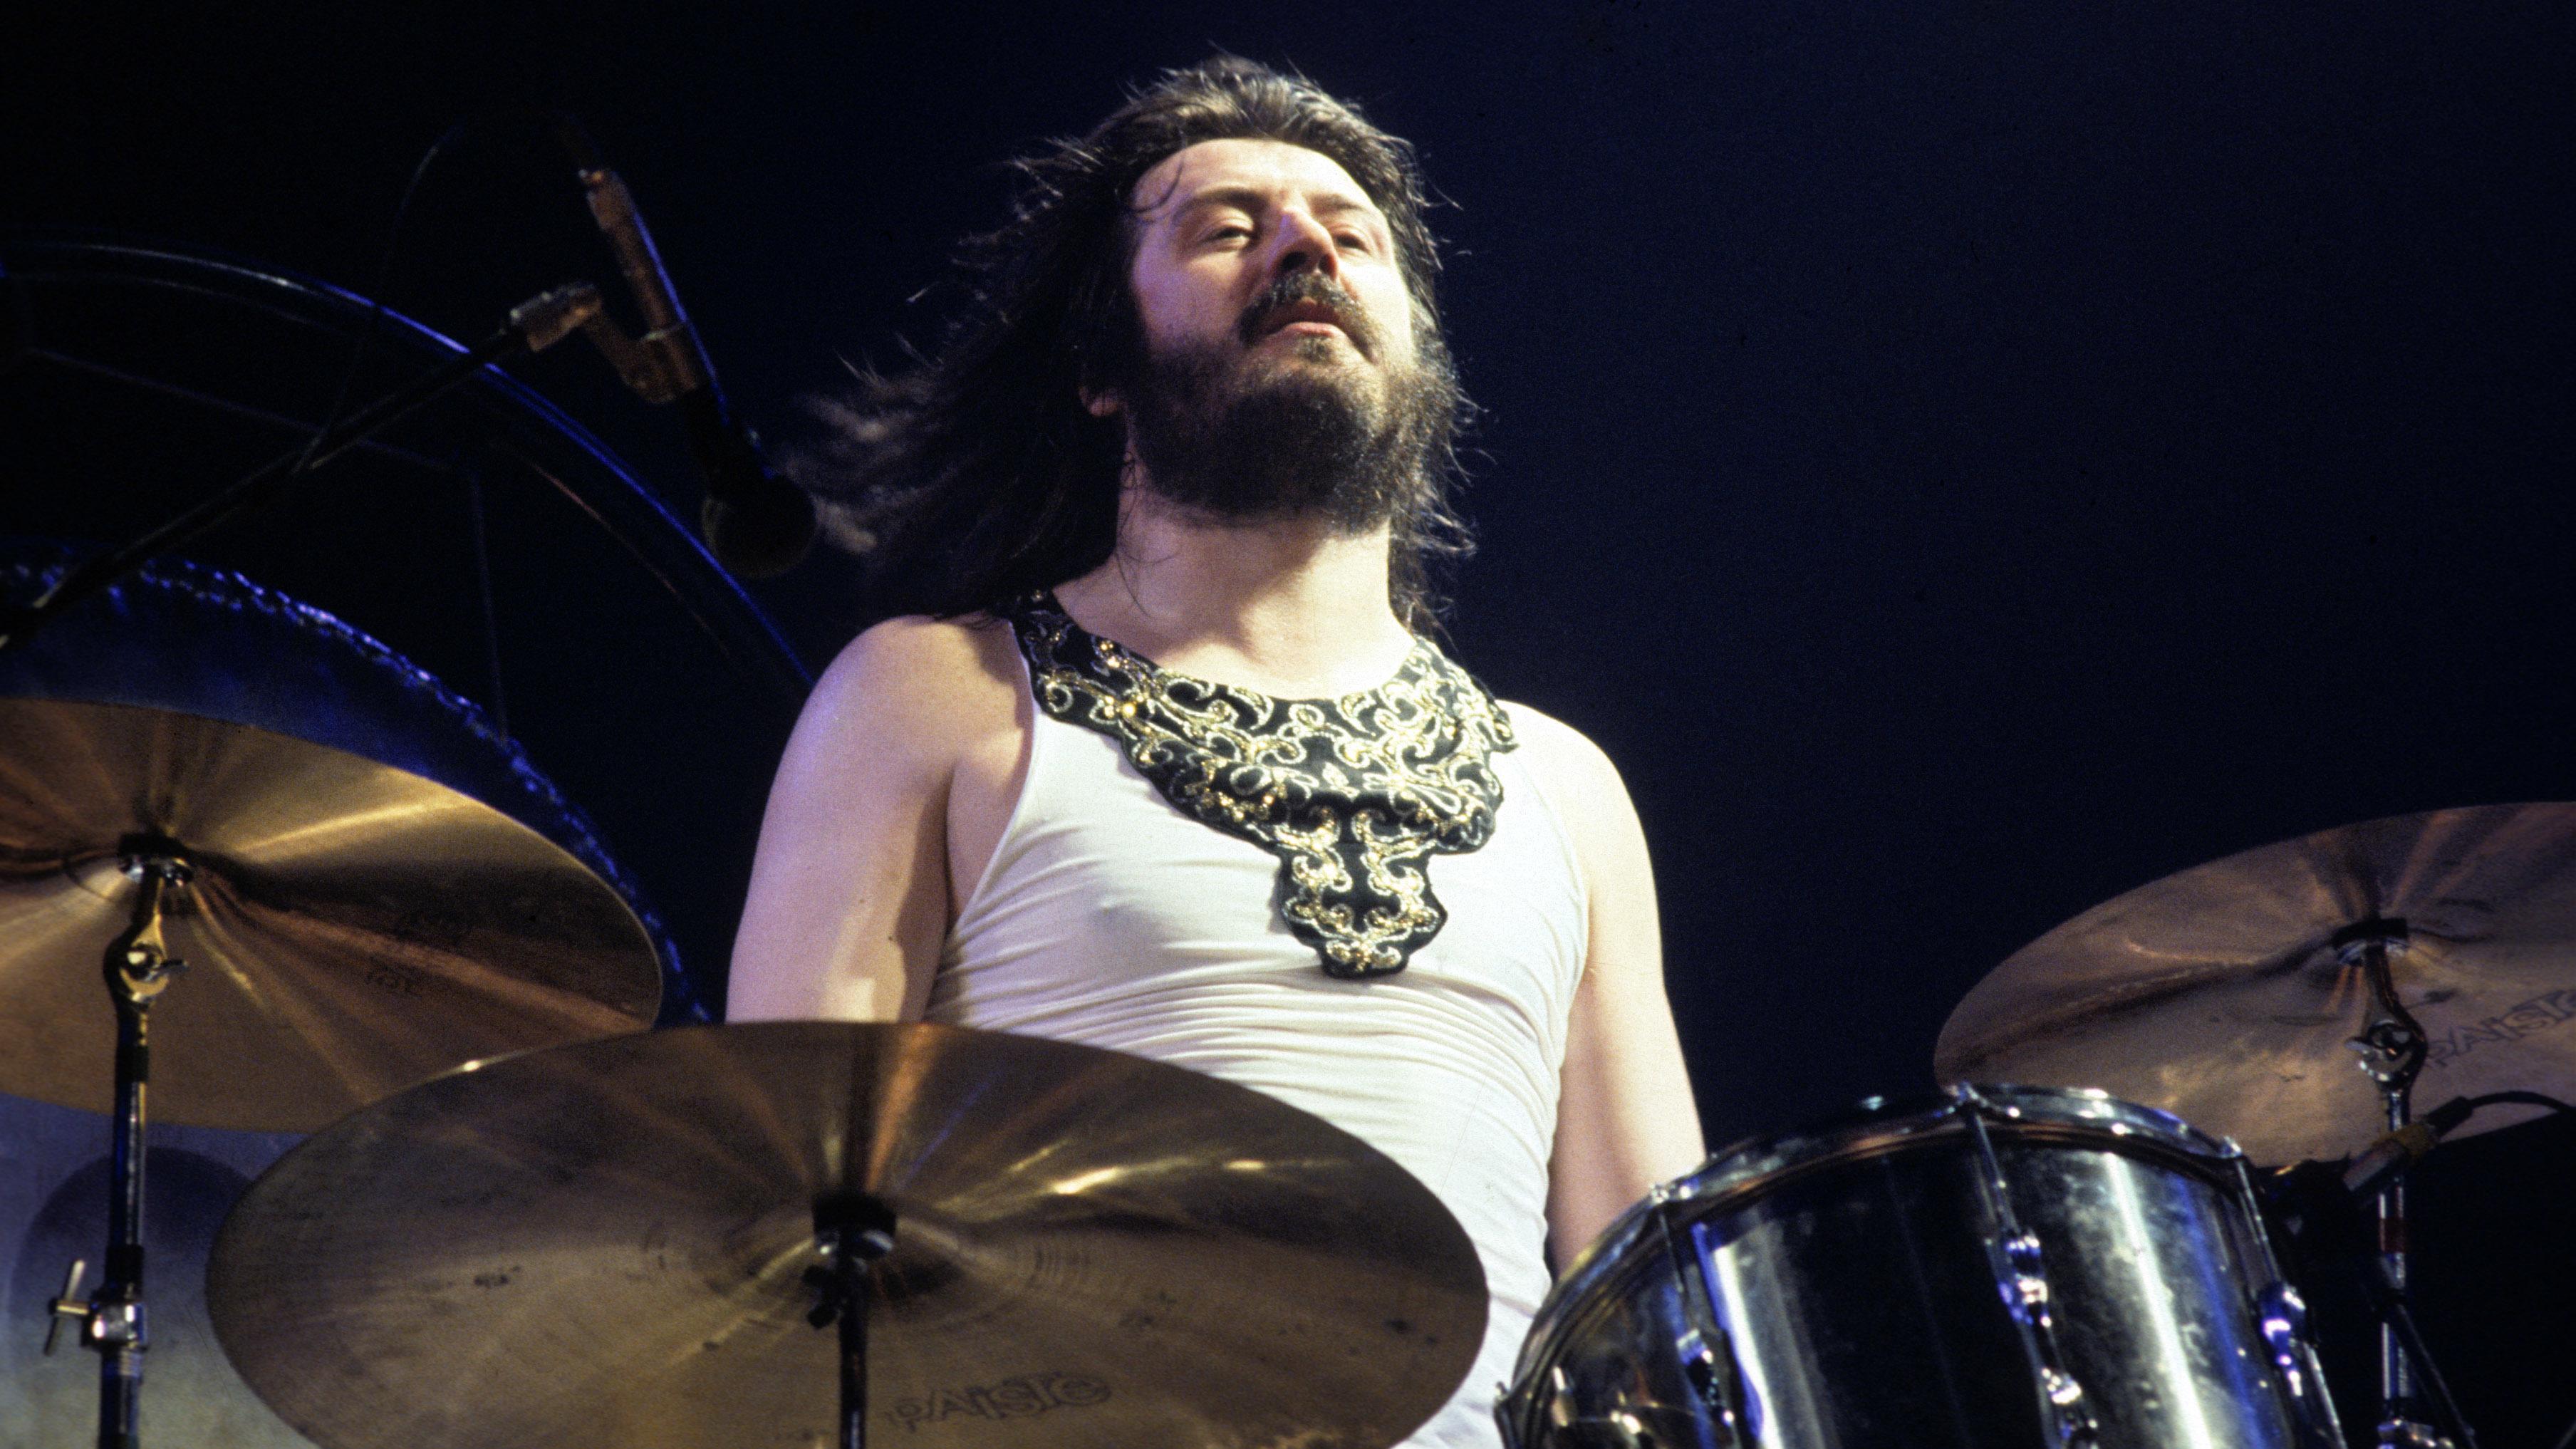 Drummer Rock and Roll Terbesar